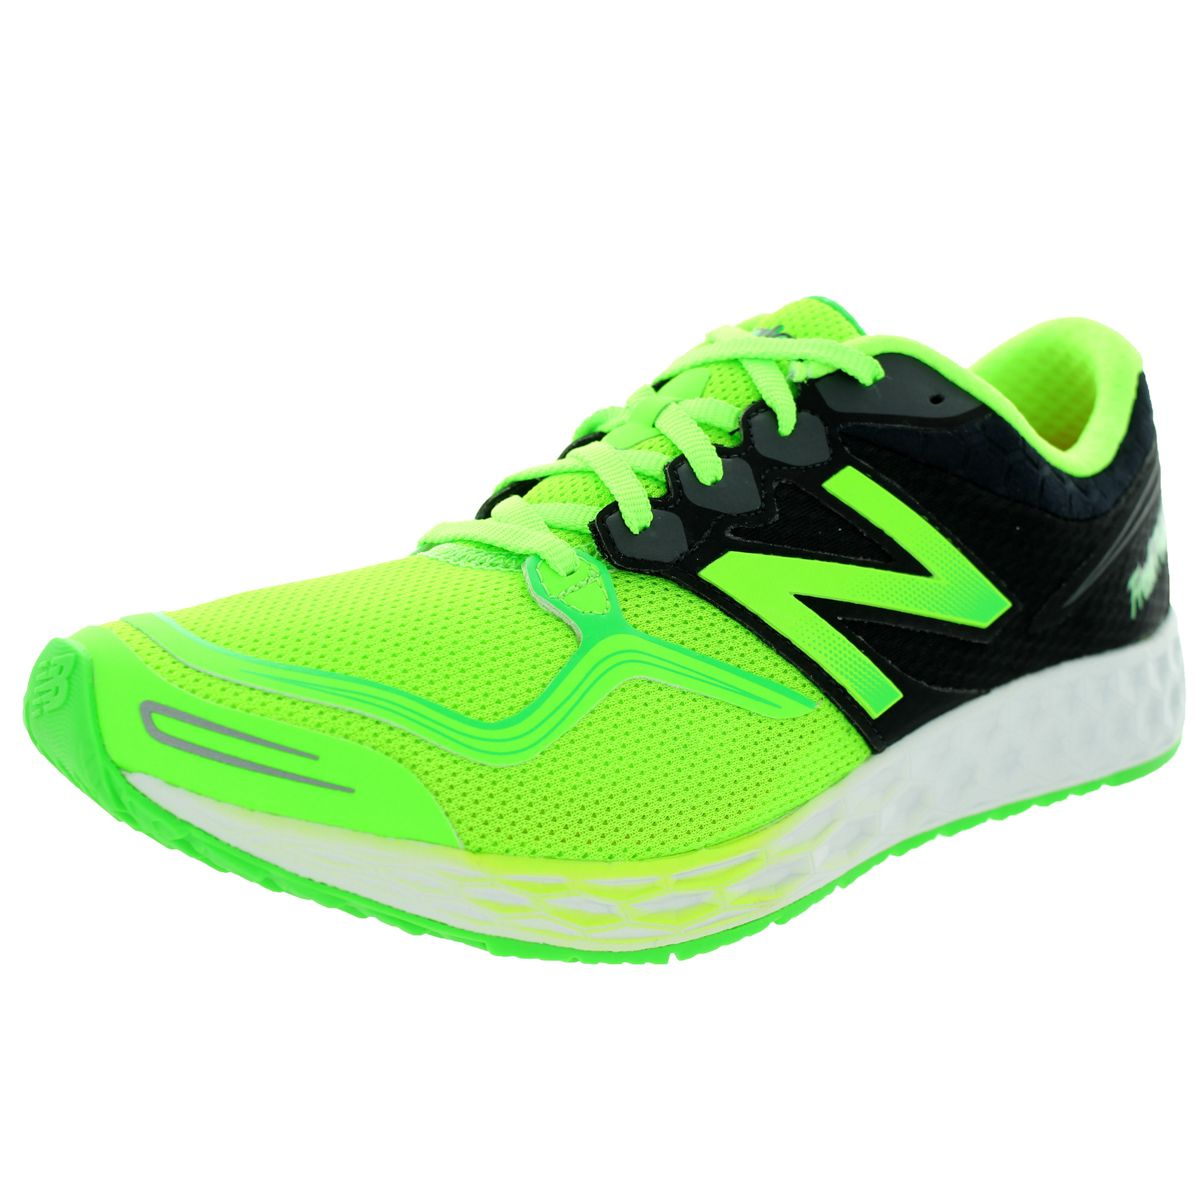 New Balance Men's Fresh Foam Zante Lime Green With Black Running Shoe